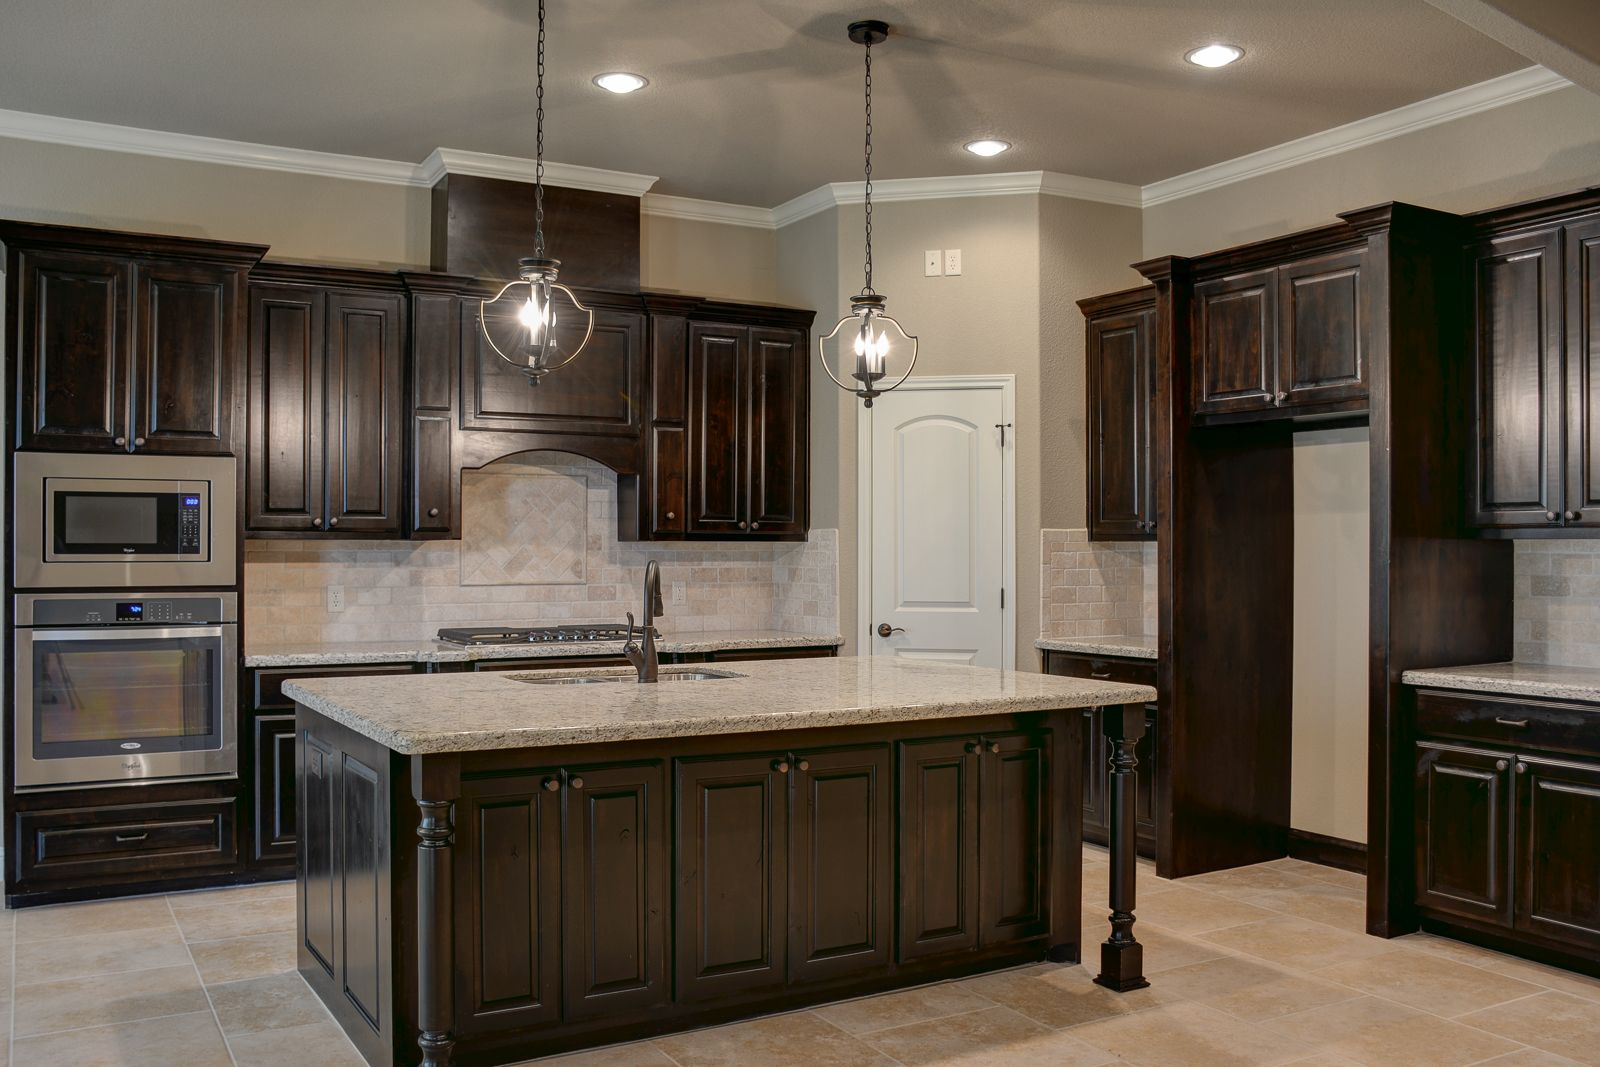 Black walnut stained knotty alder cabinets. | Kitchens ...